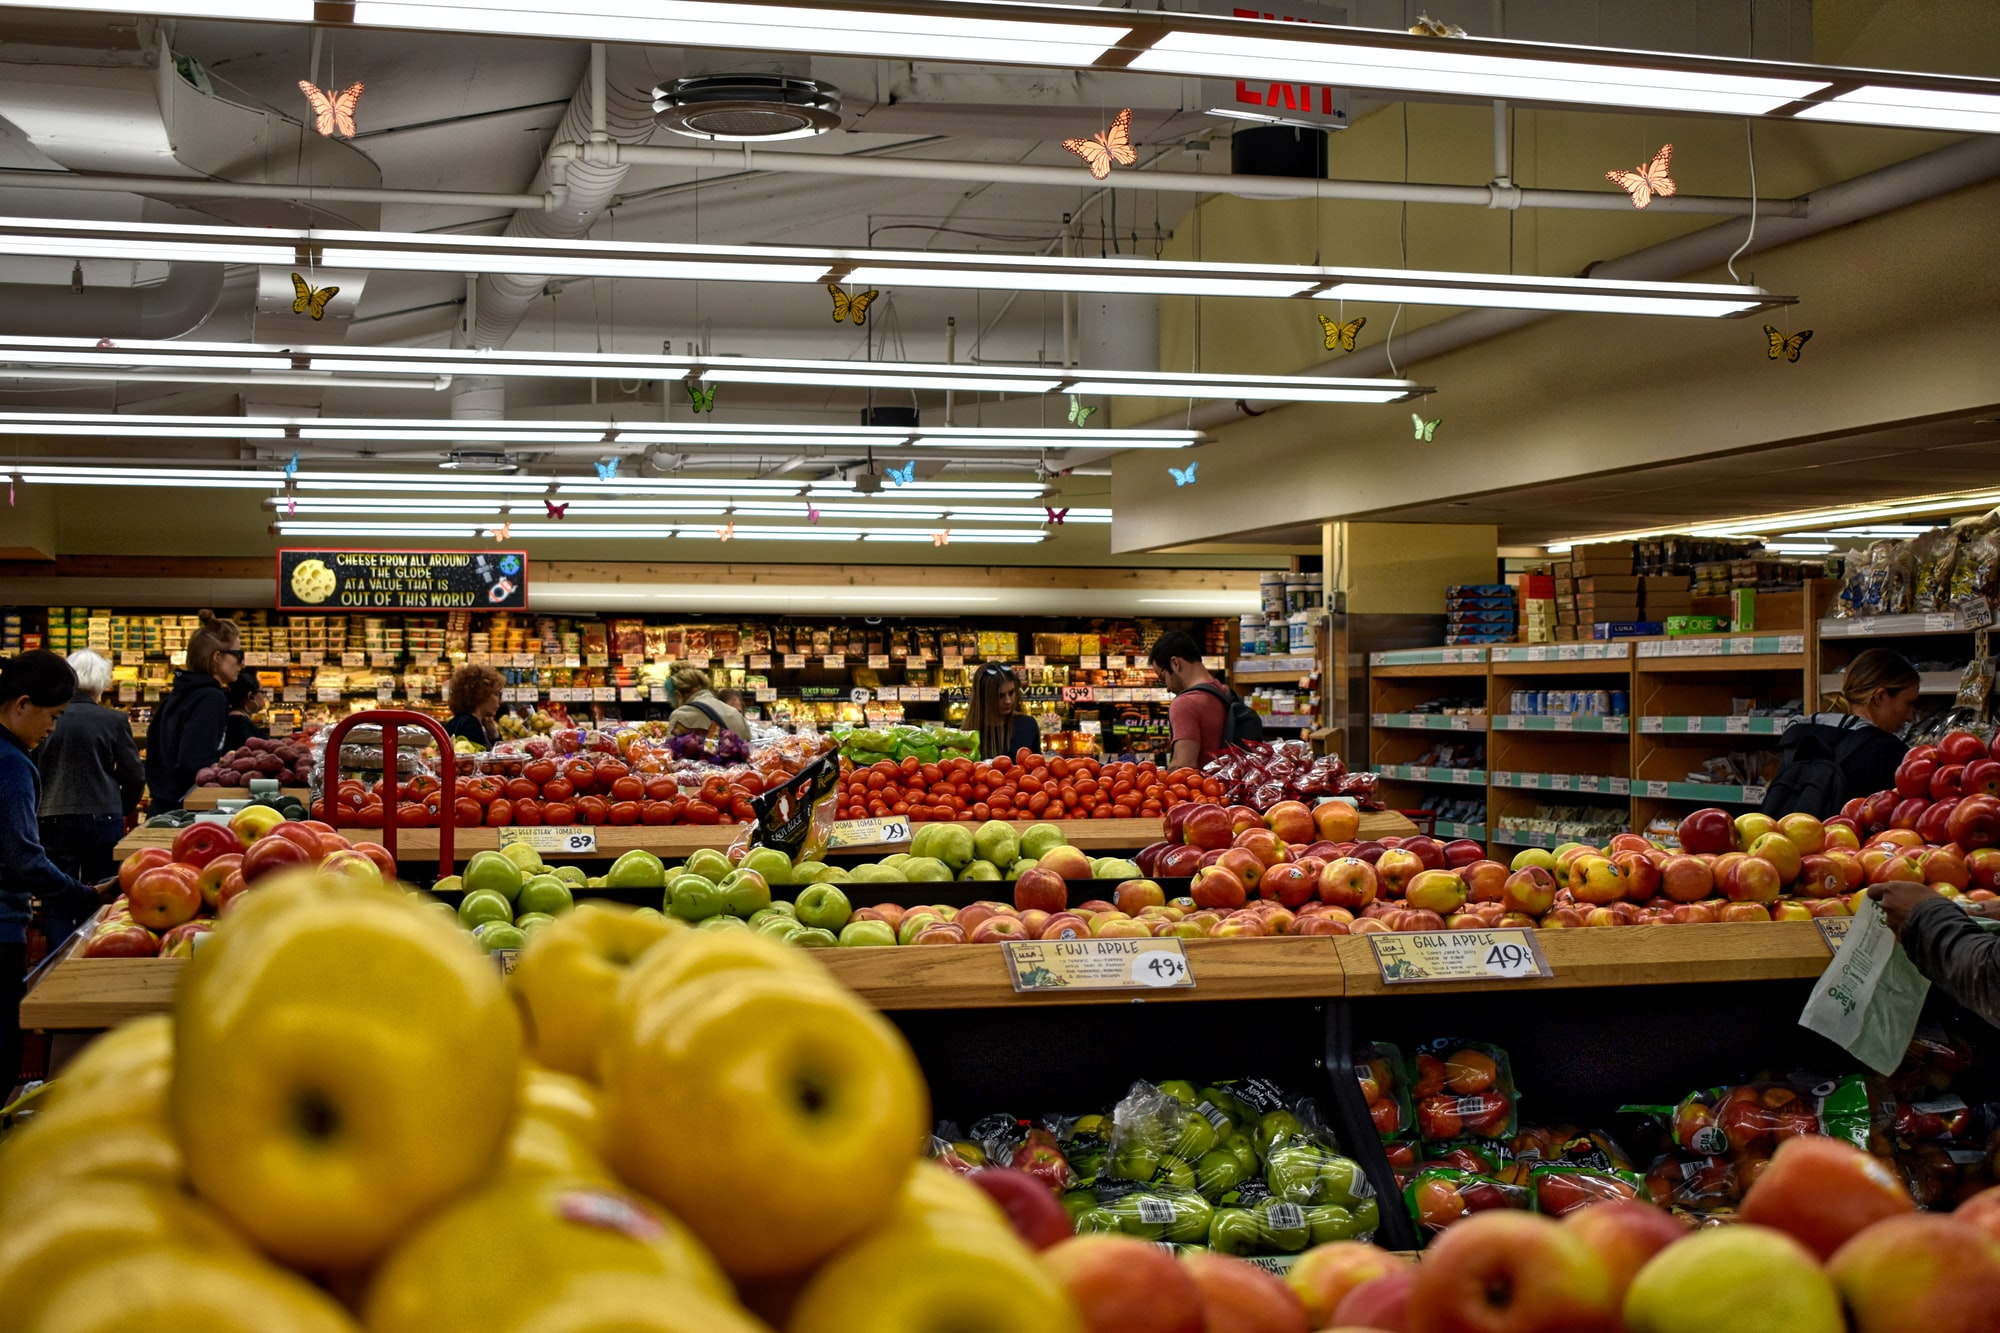 What Criteria Matter When Choosing a Digital Retail Platform?